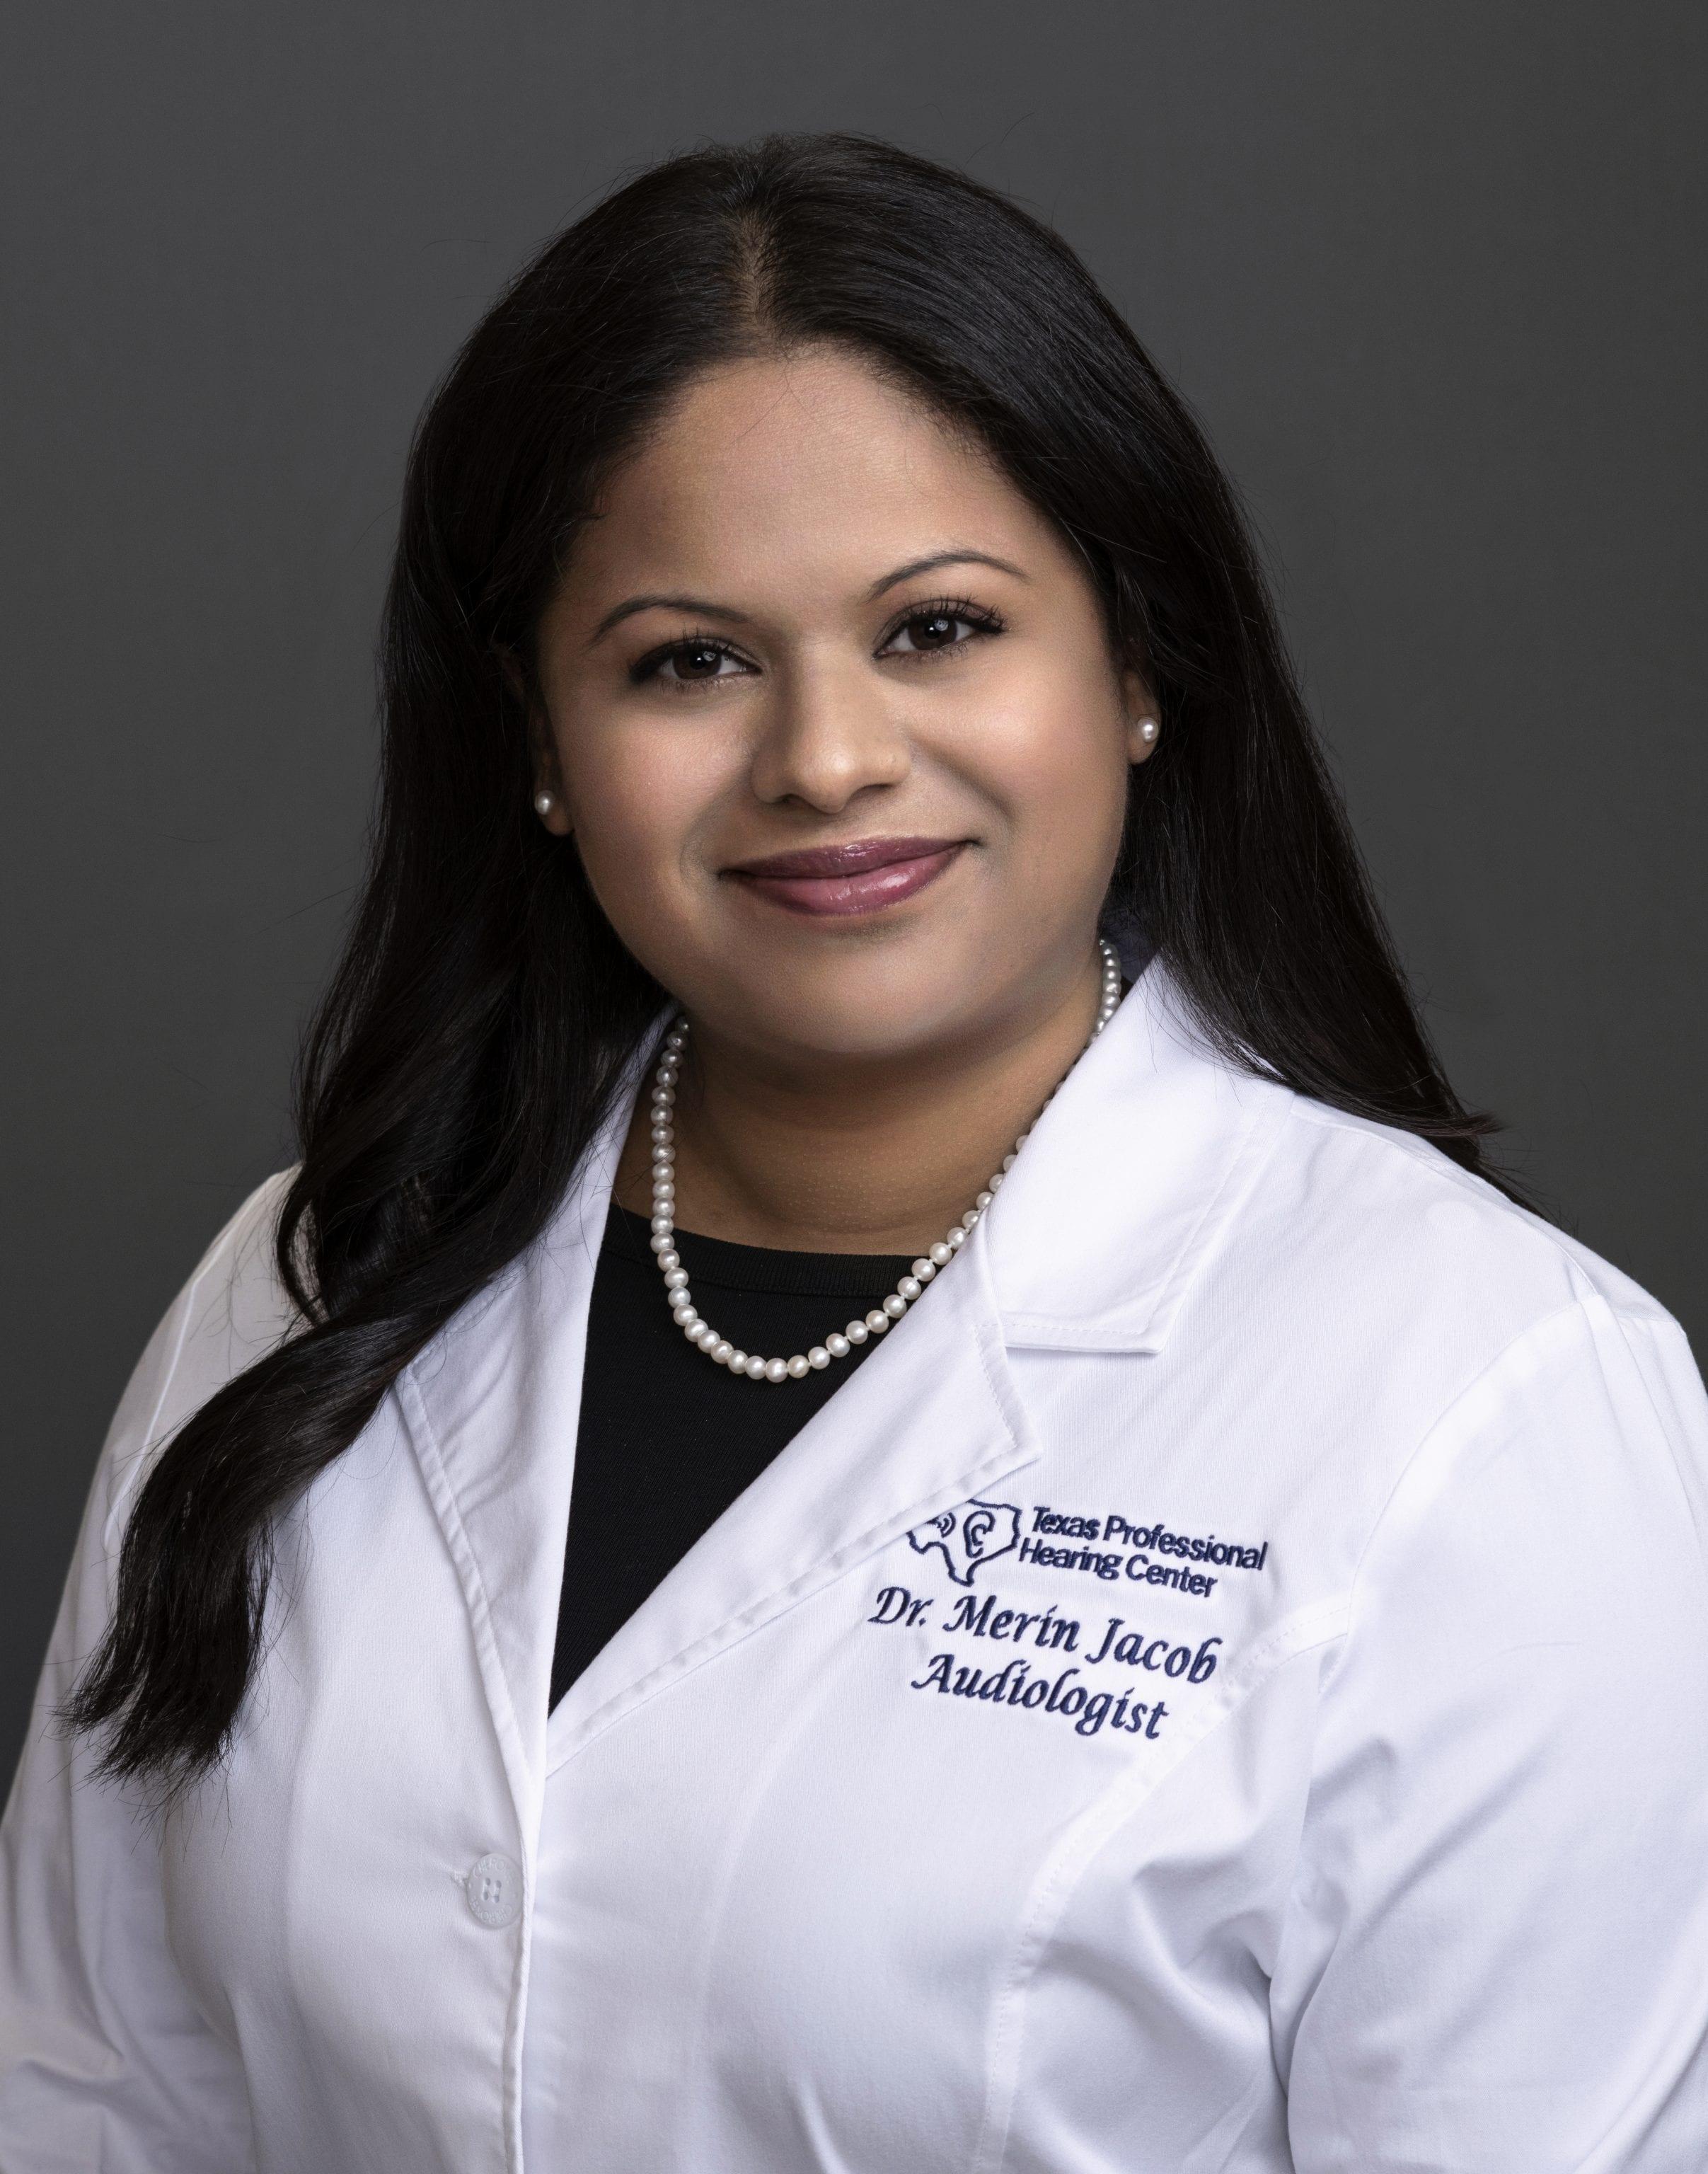 Dr. Merin Jacob : Audiologist